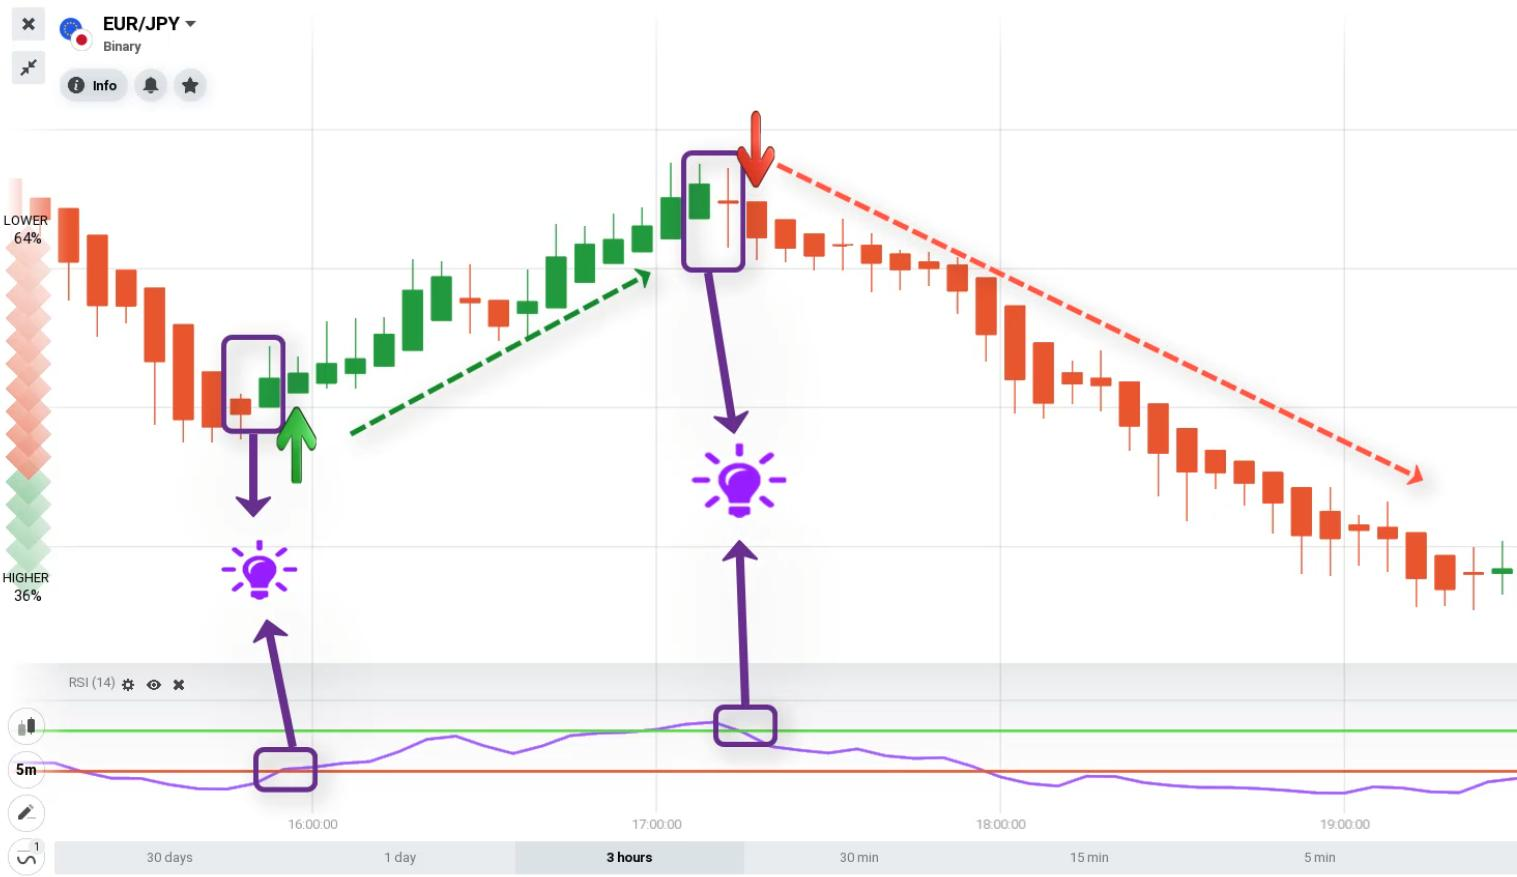 Strategi perdagangan menggunakan RSI yang dikombinasikan dengan grafik kandil Heiken Ashi